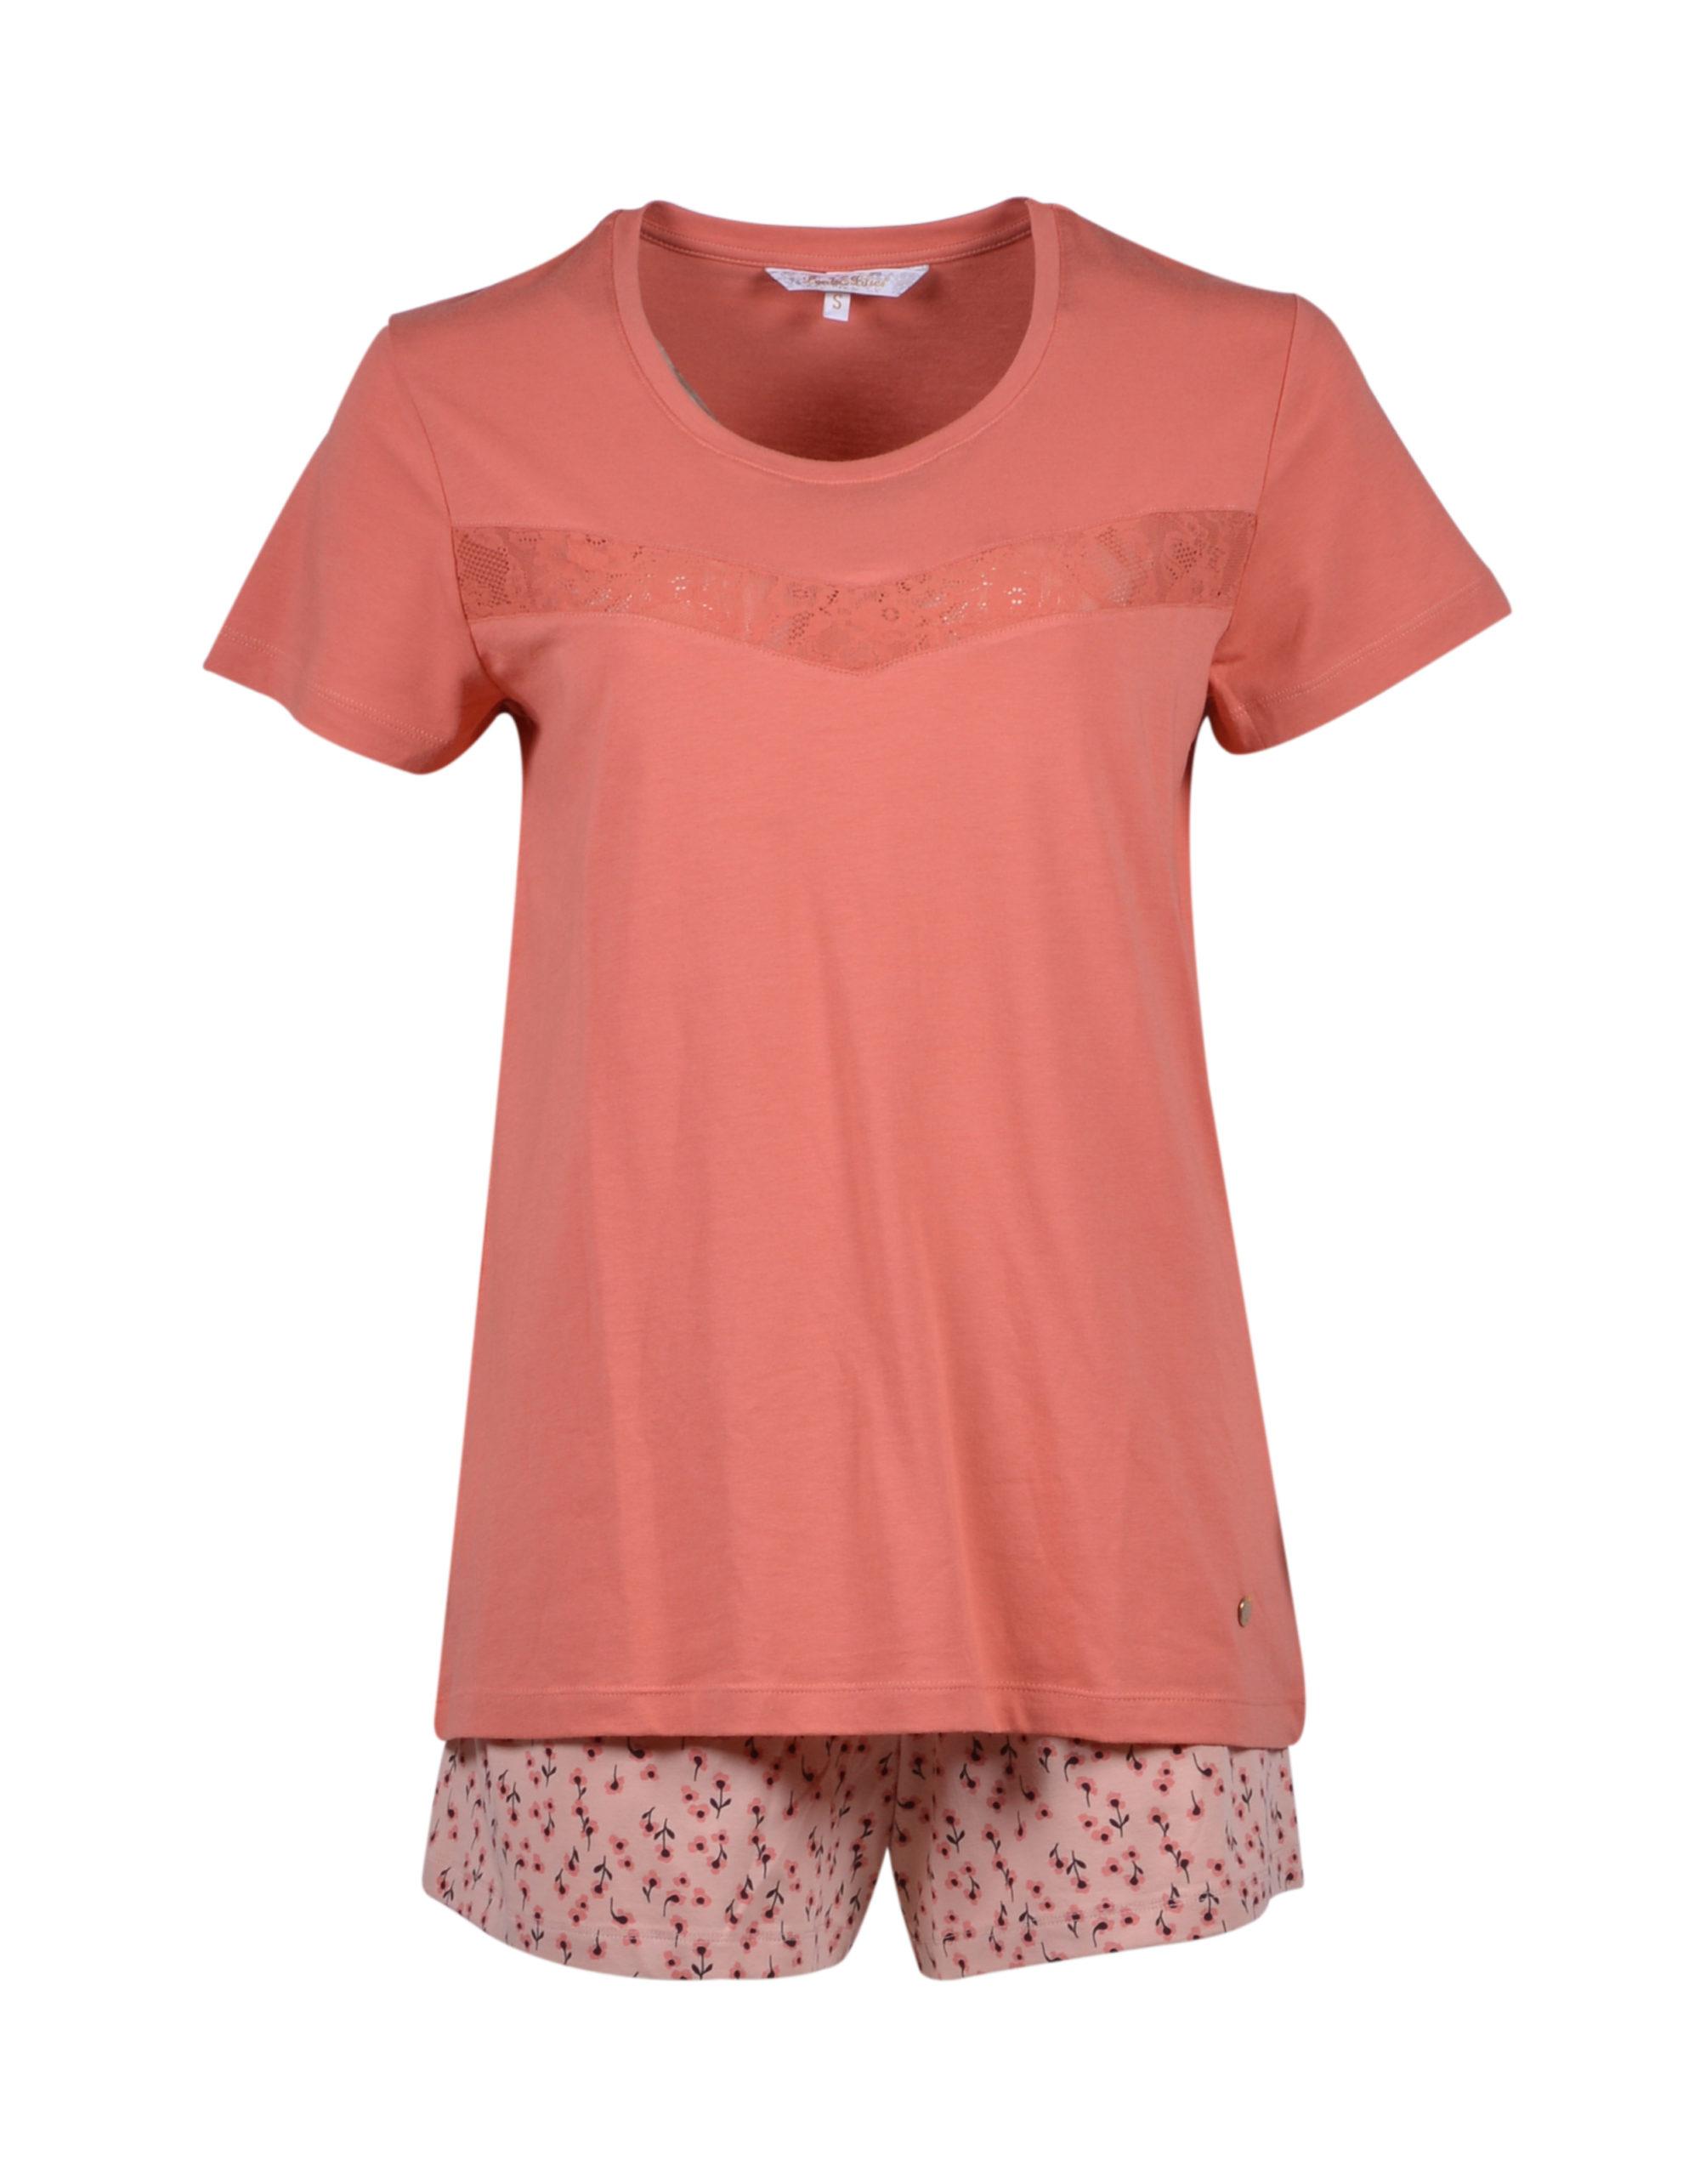 LORDS & LILIES Dames pyjama, abrikoosoranje